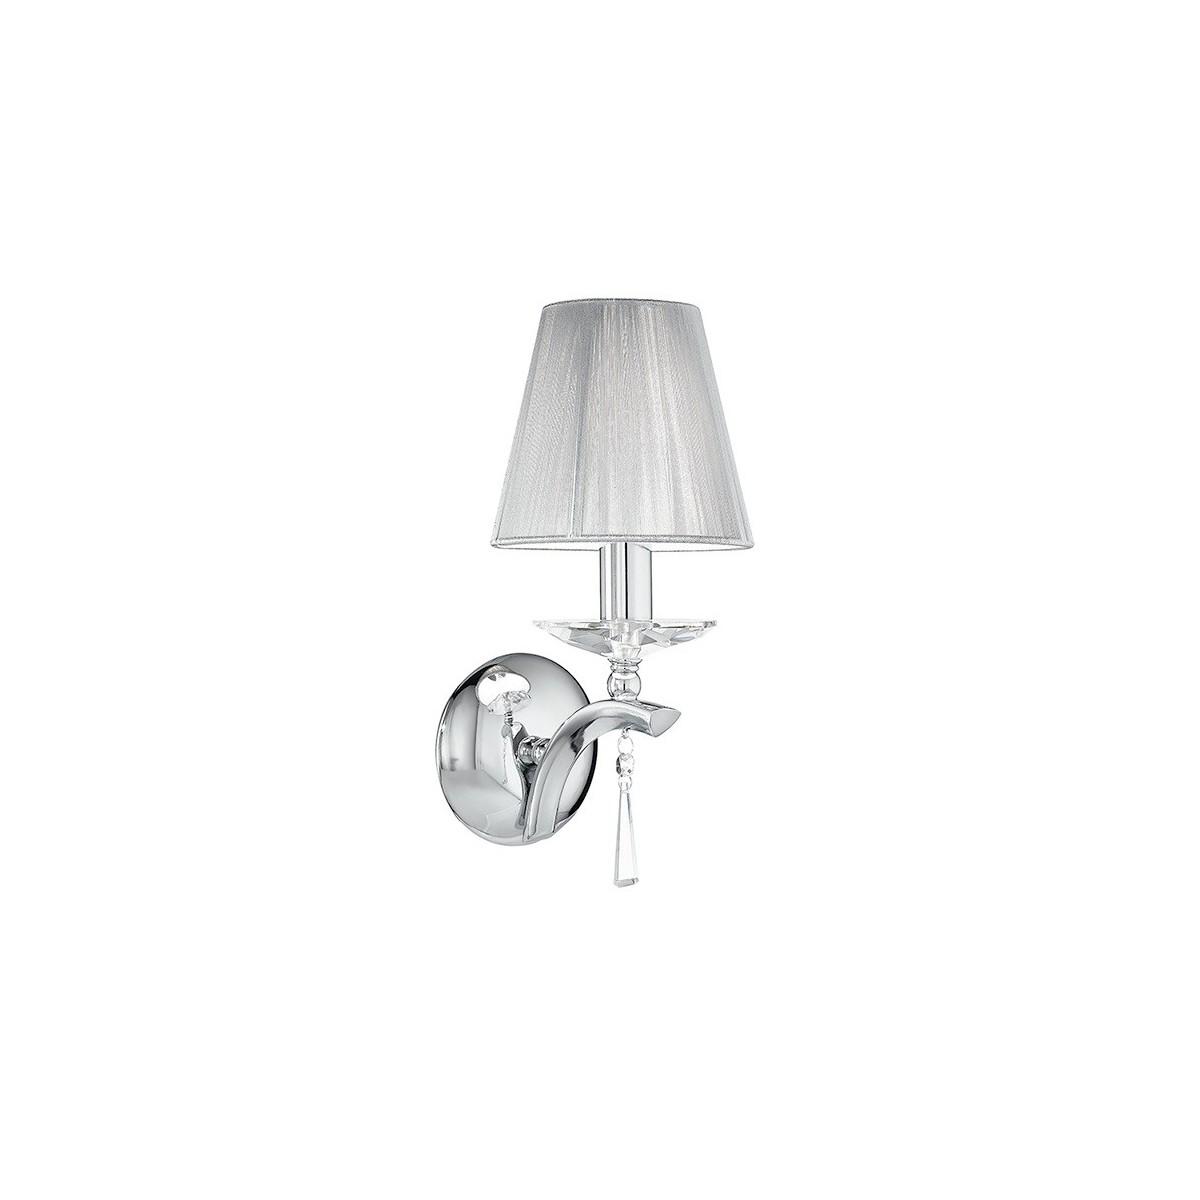 I-ORCHESTRA/AP1 - Applique Elegante Metallo Cristallo K9 paralume Tessuto Lampada Classica E14